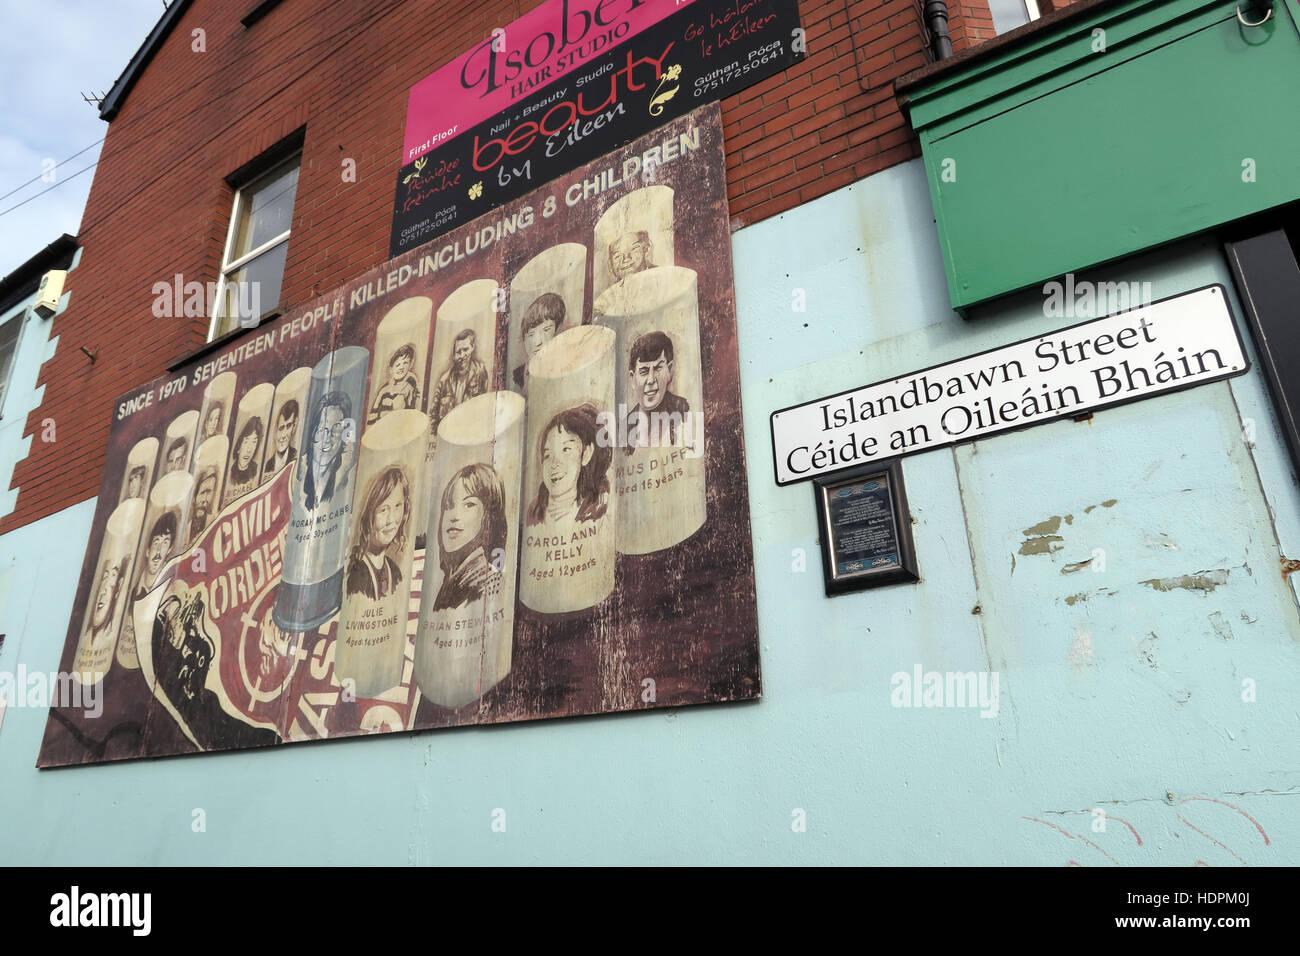 Belfast Falls Rd Republican Mural,Civil Order,Islandbawn street - Stock Image